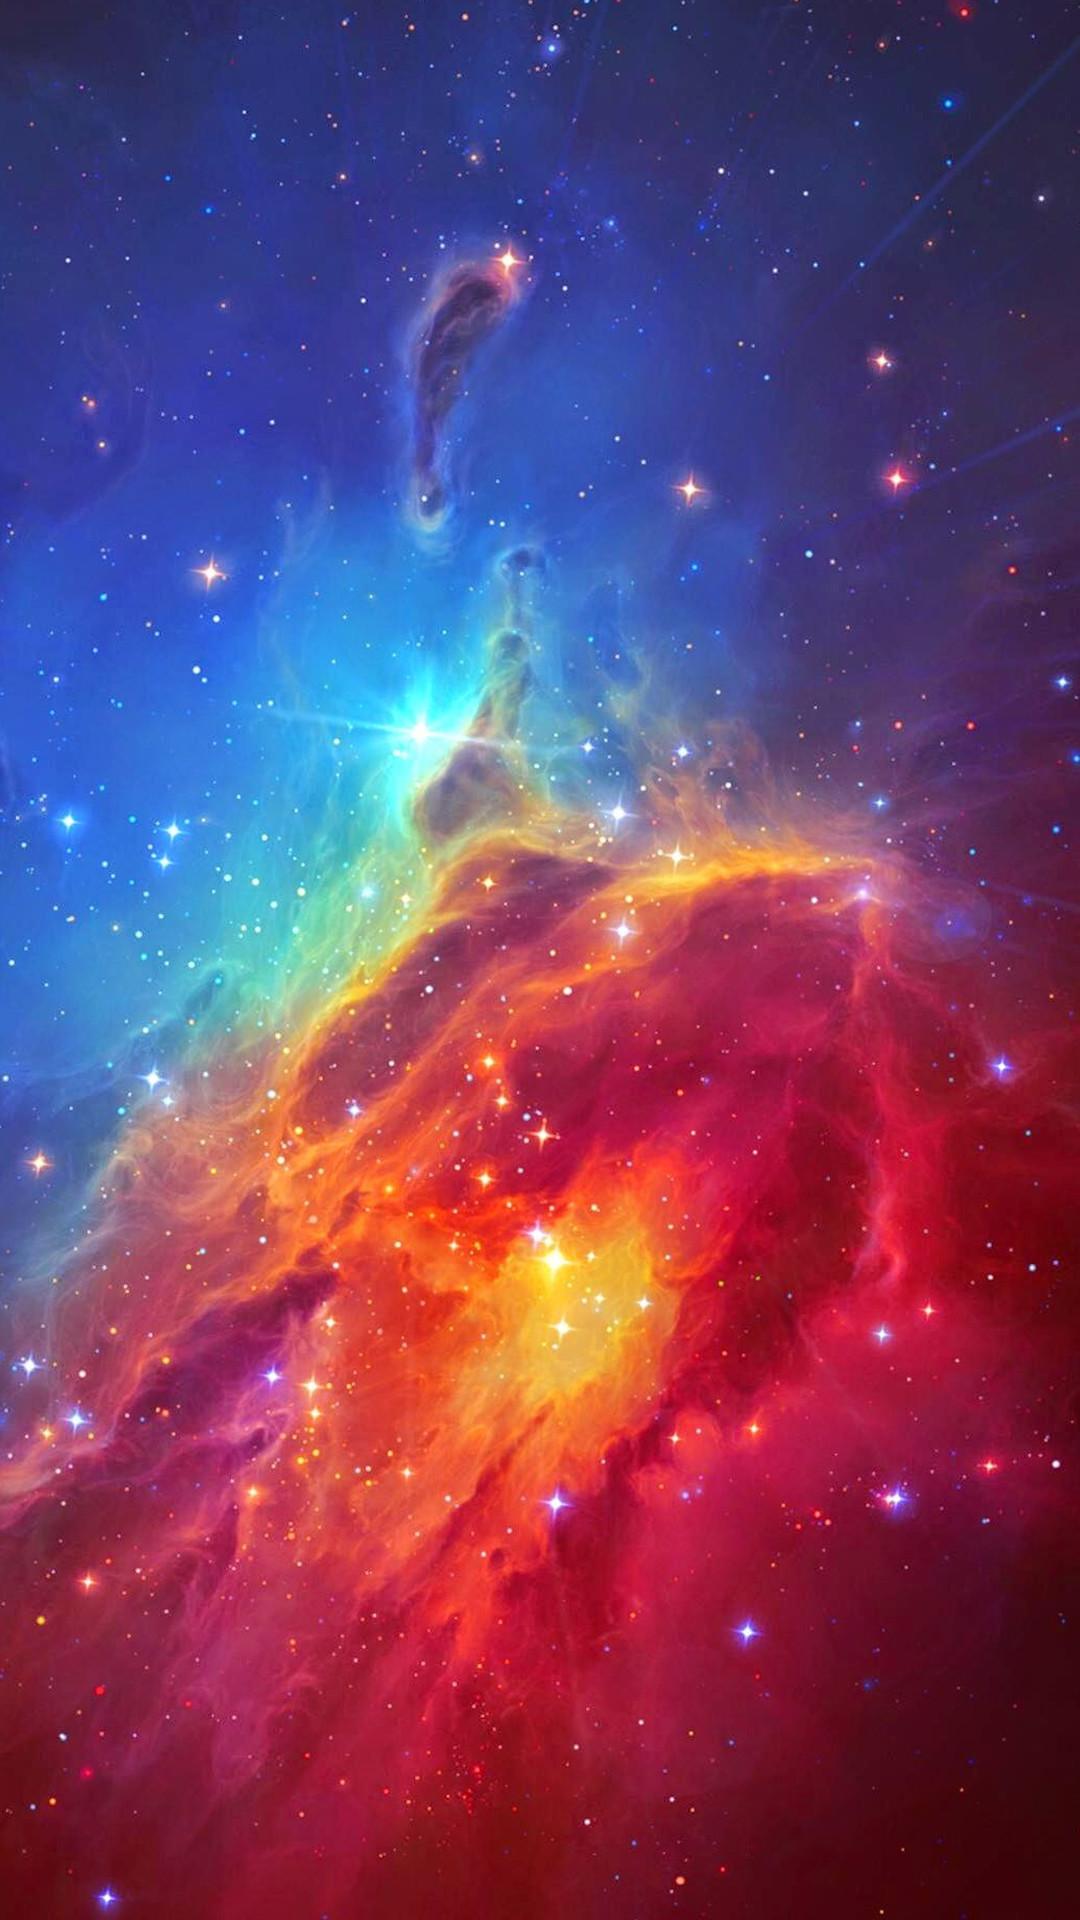 Stunning Colorful Space Nebula iPhone 8 wallpaper